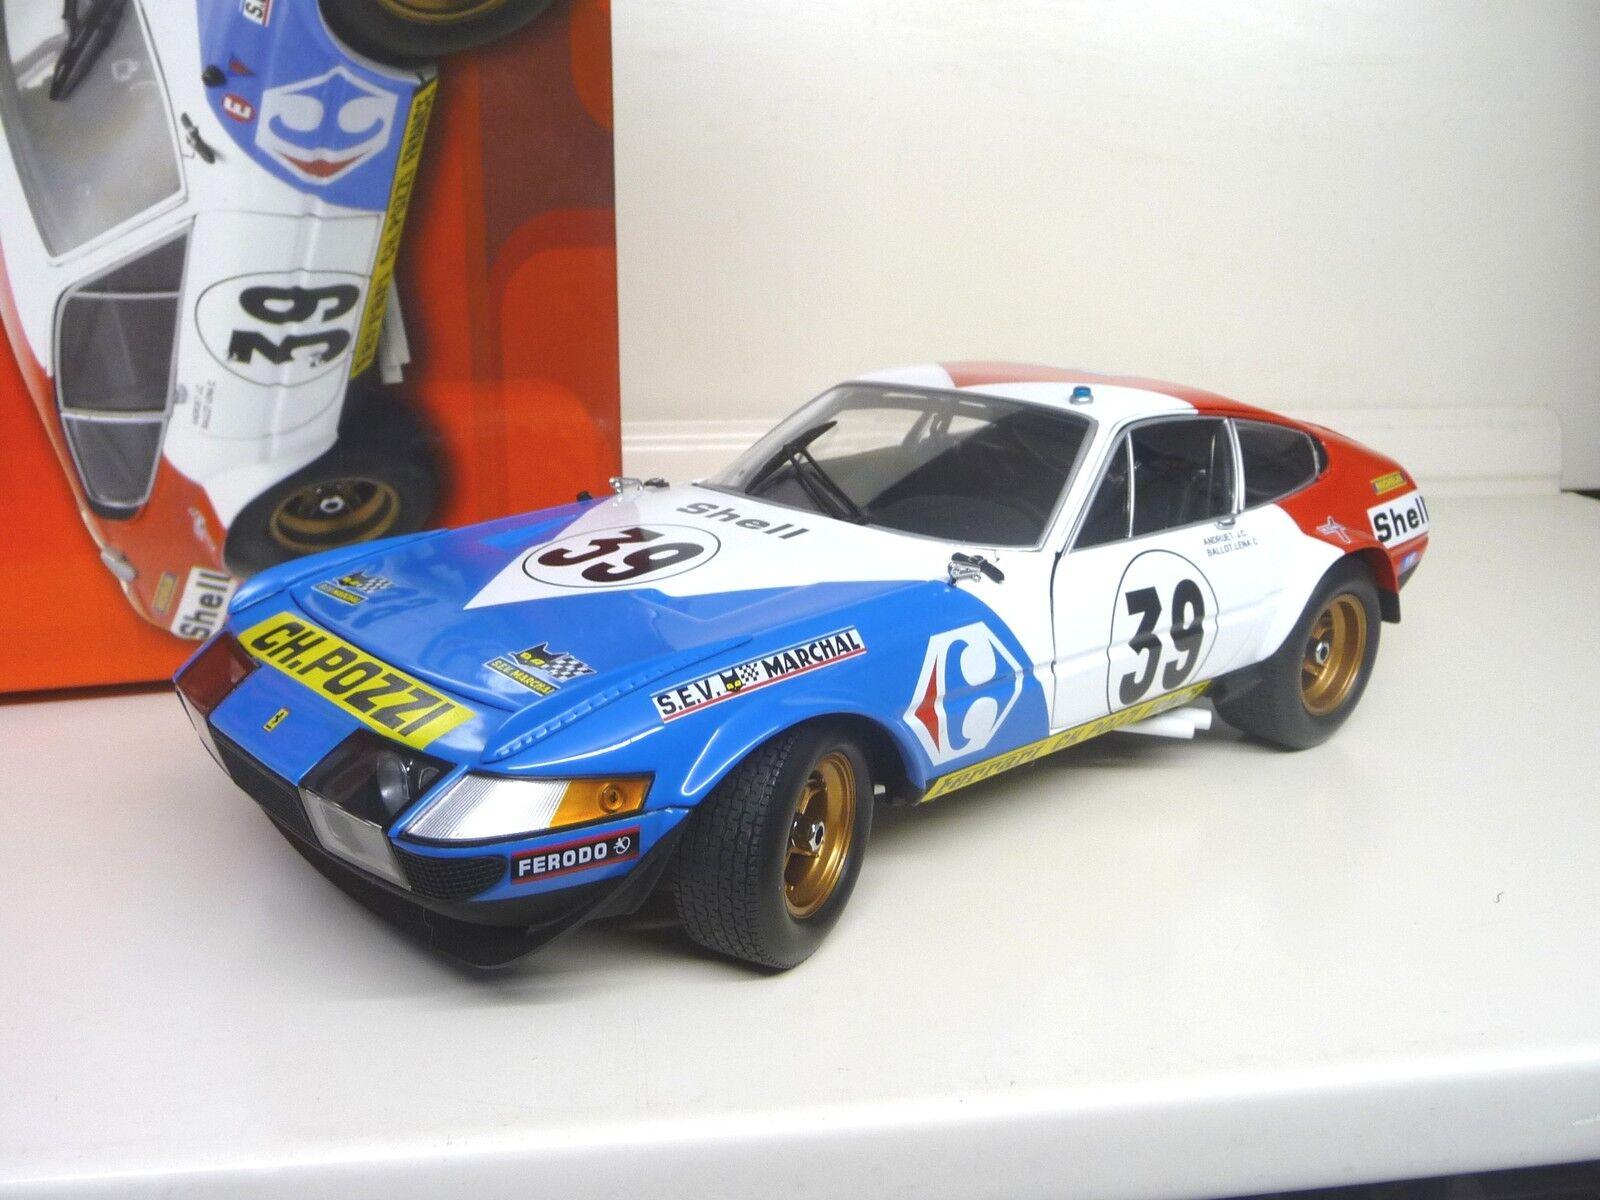 1:18 Kyosho Ferrari 365 gtb4 Competizione #39 Daytona Carrefour Neuf New | Promotions  | Online Shop  | La Conception Professionnelle